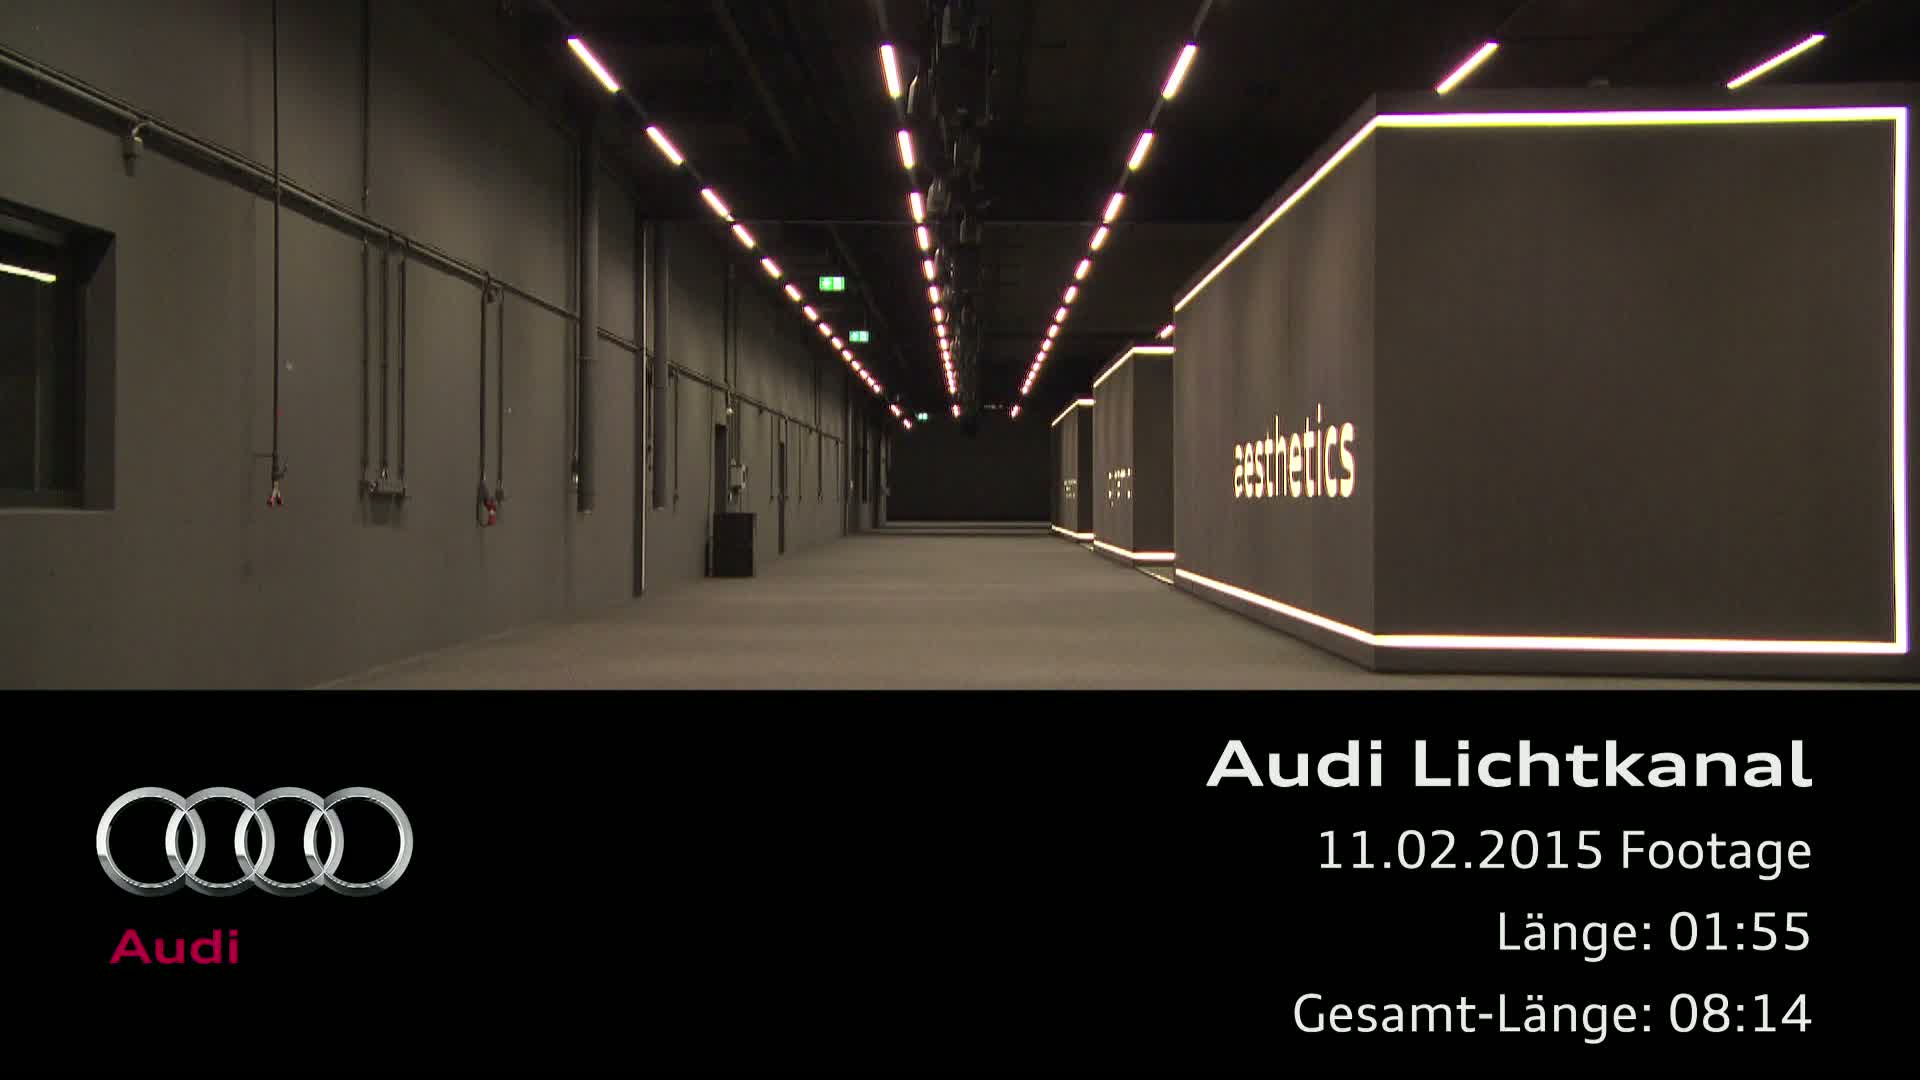 Audi Lichtkanal - Footage